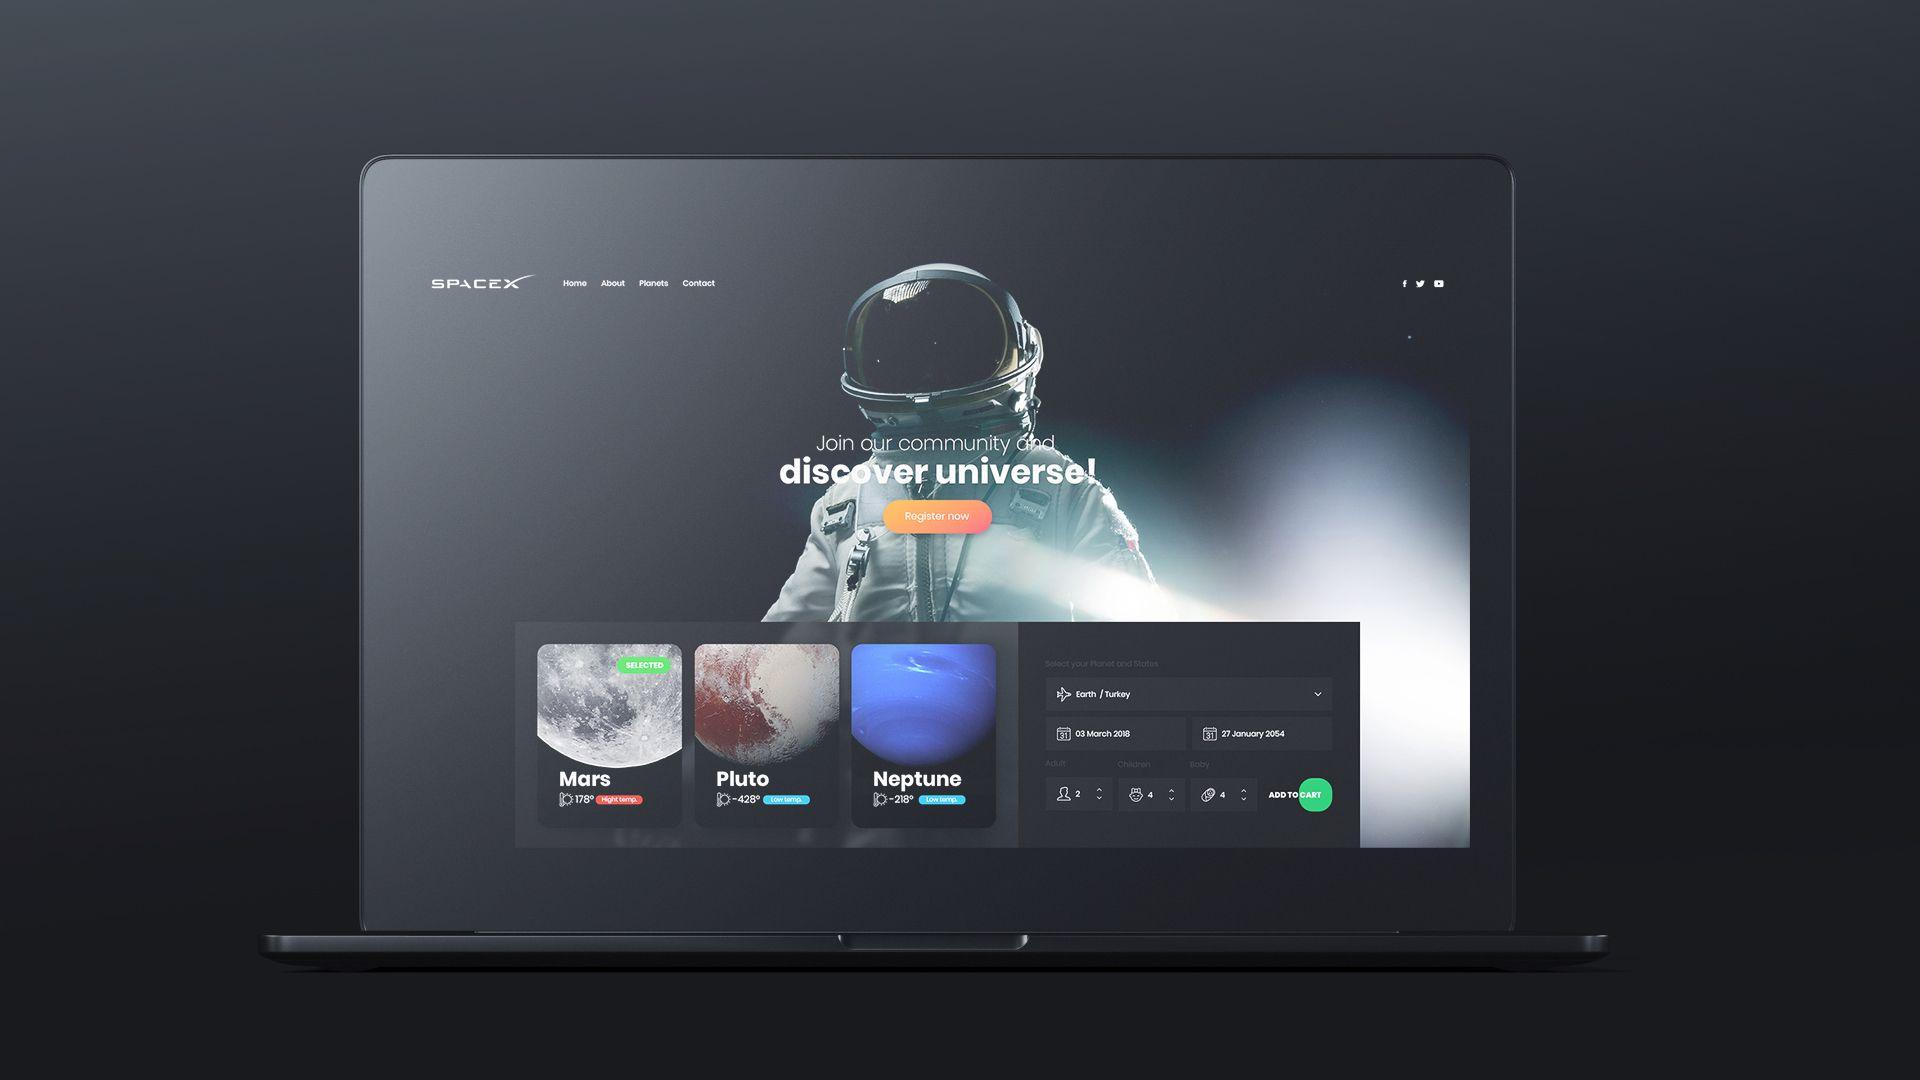 Macbook Modern Web Design Web Design Inspiration Web Design